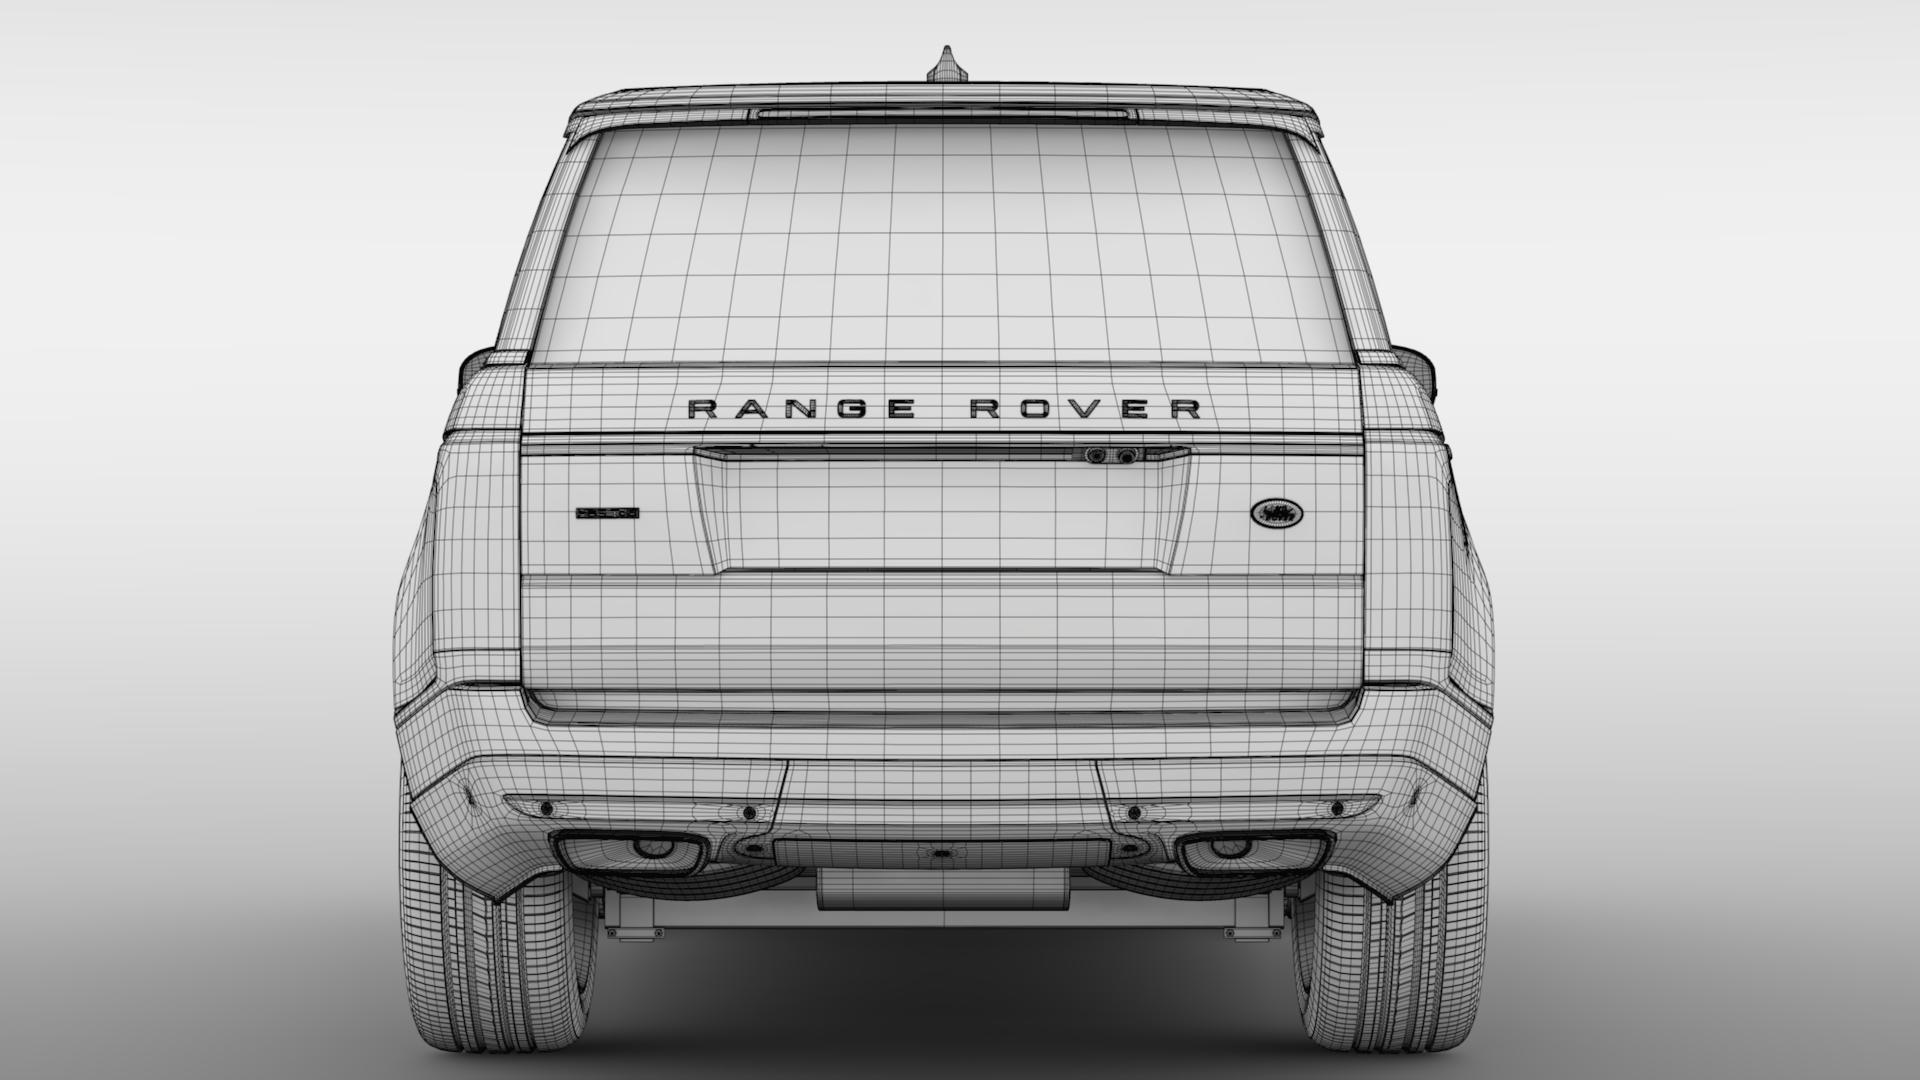 range rover hse td6 lwb l405 2018 3d model max fbx c4d lwo ma mb hrc xsi obj 277401